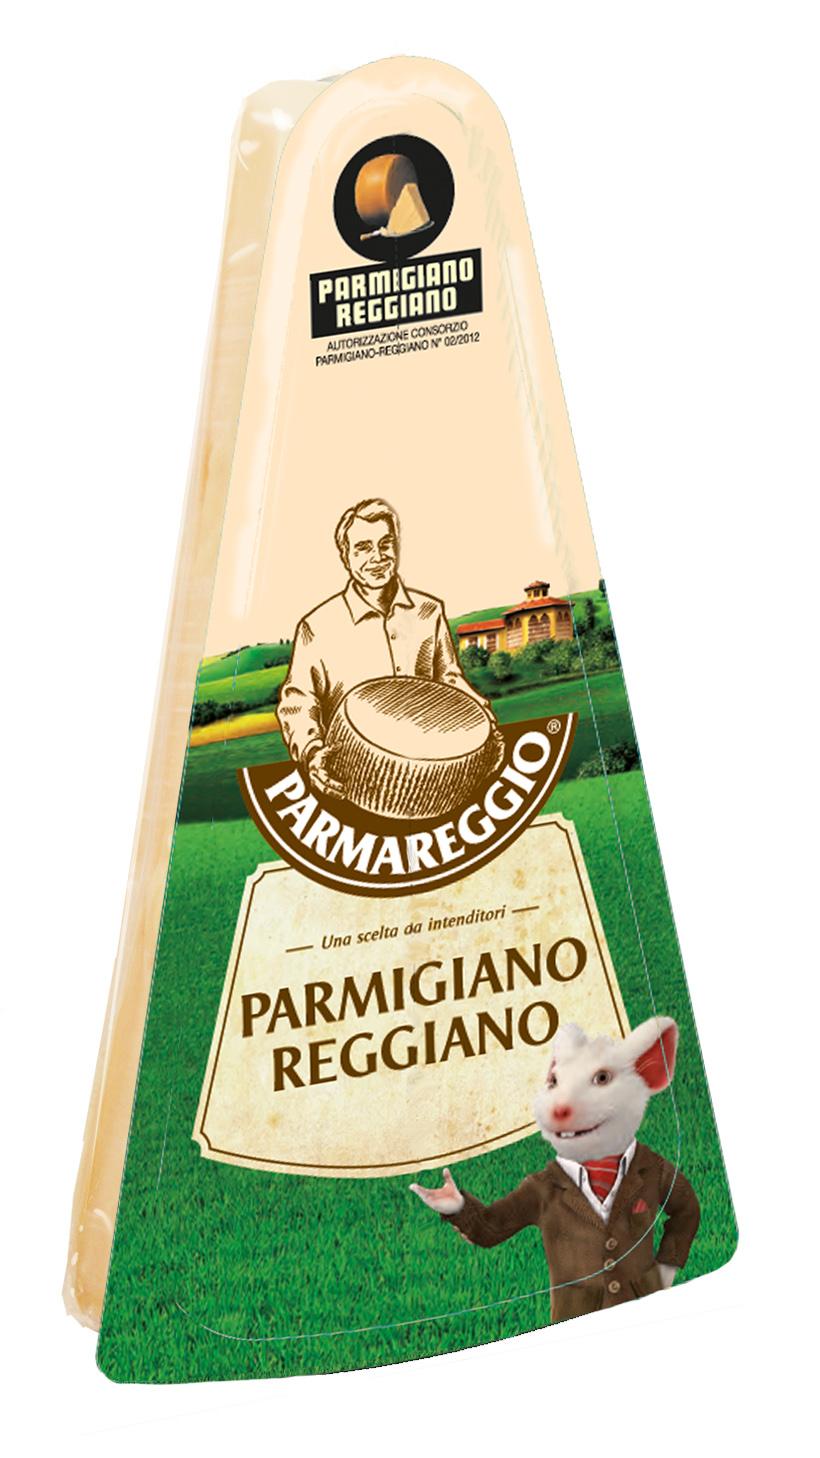 PARMIGIANO REG. PARMAREGGIO 200g